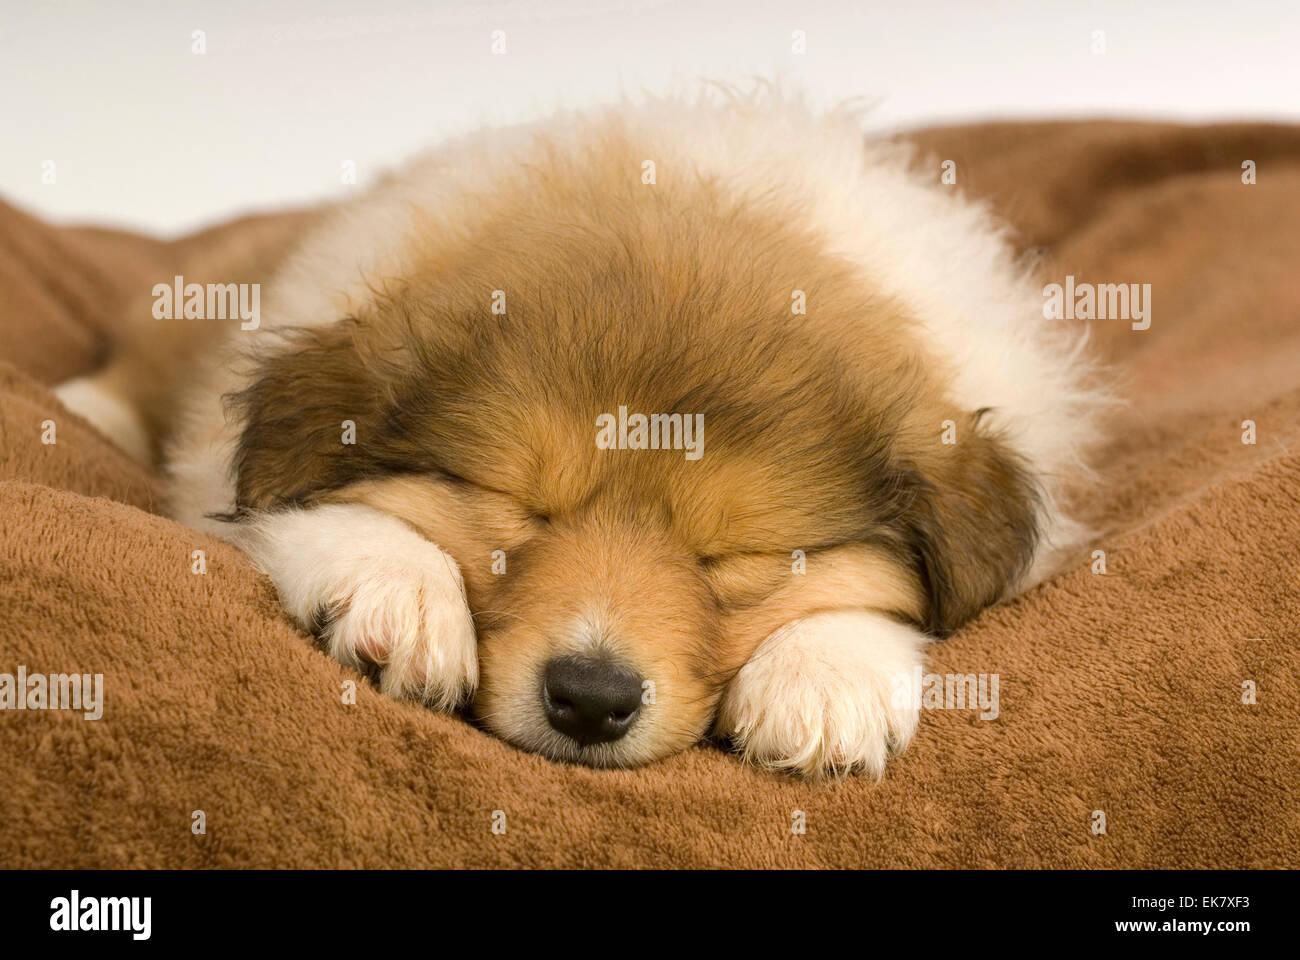 Dog Behaviour Sleeping On Yiur Bed